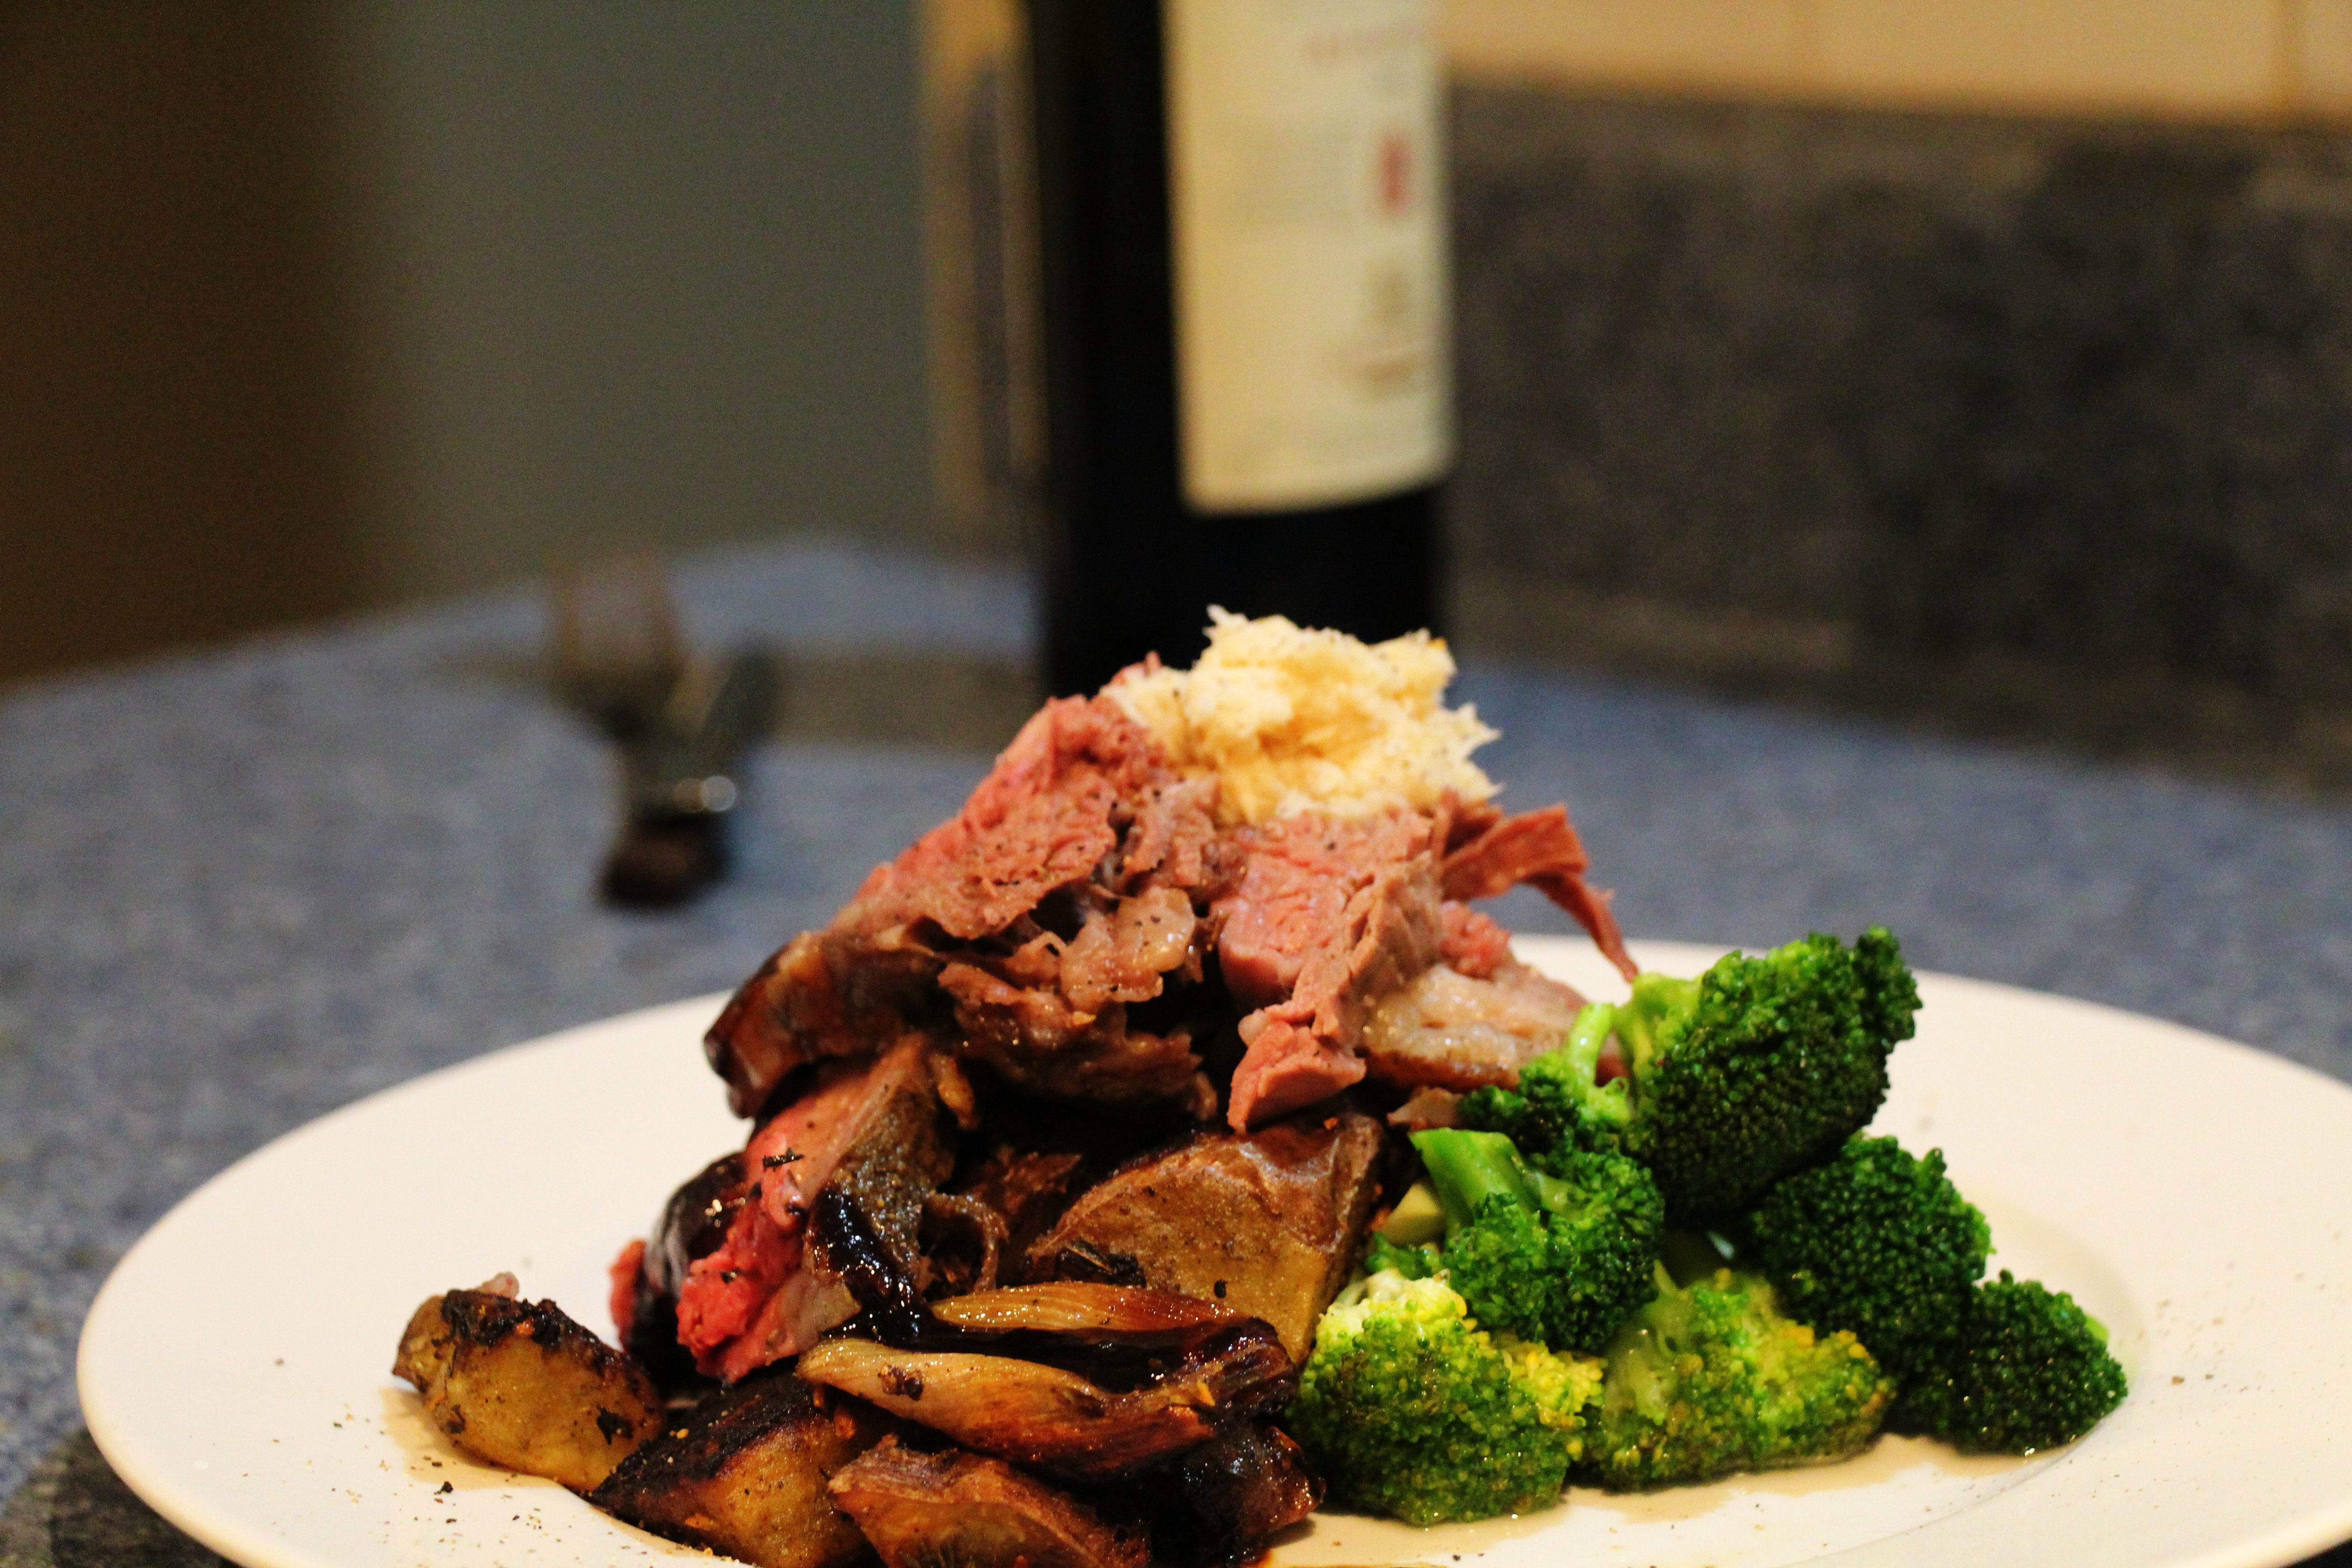 Prime Rib Time Chart: Beef Prime Rib Dinner.jpg - Wikimedia Commons,Chart